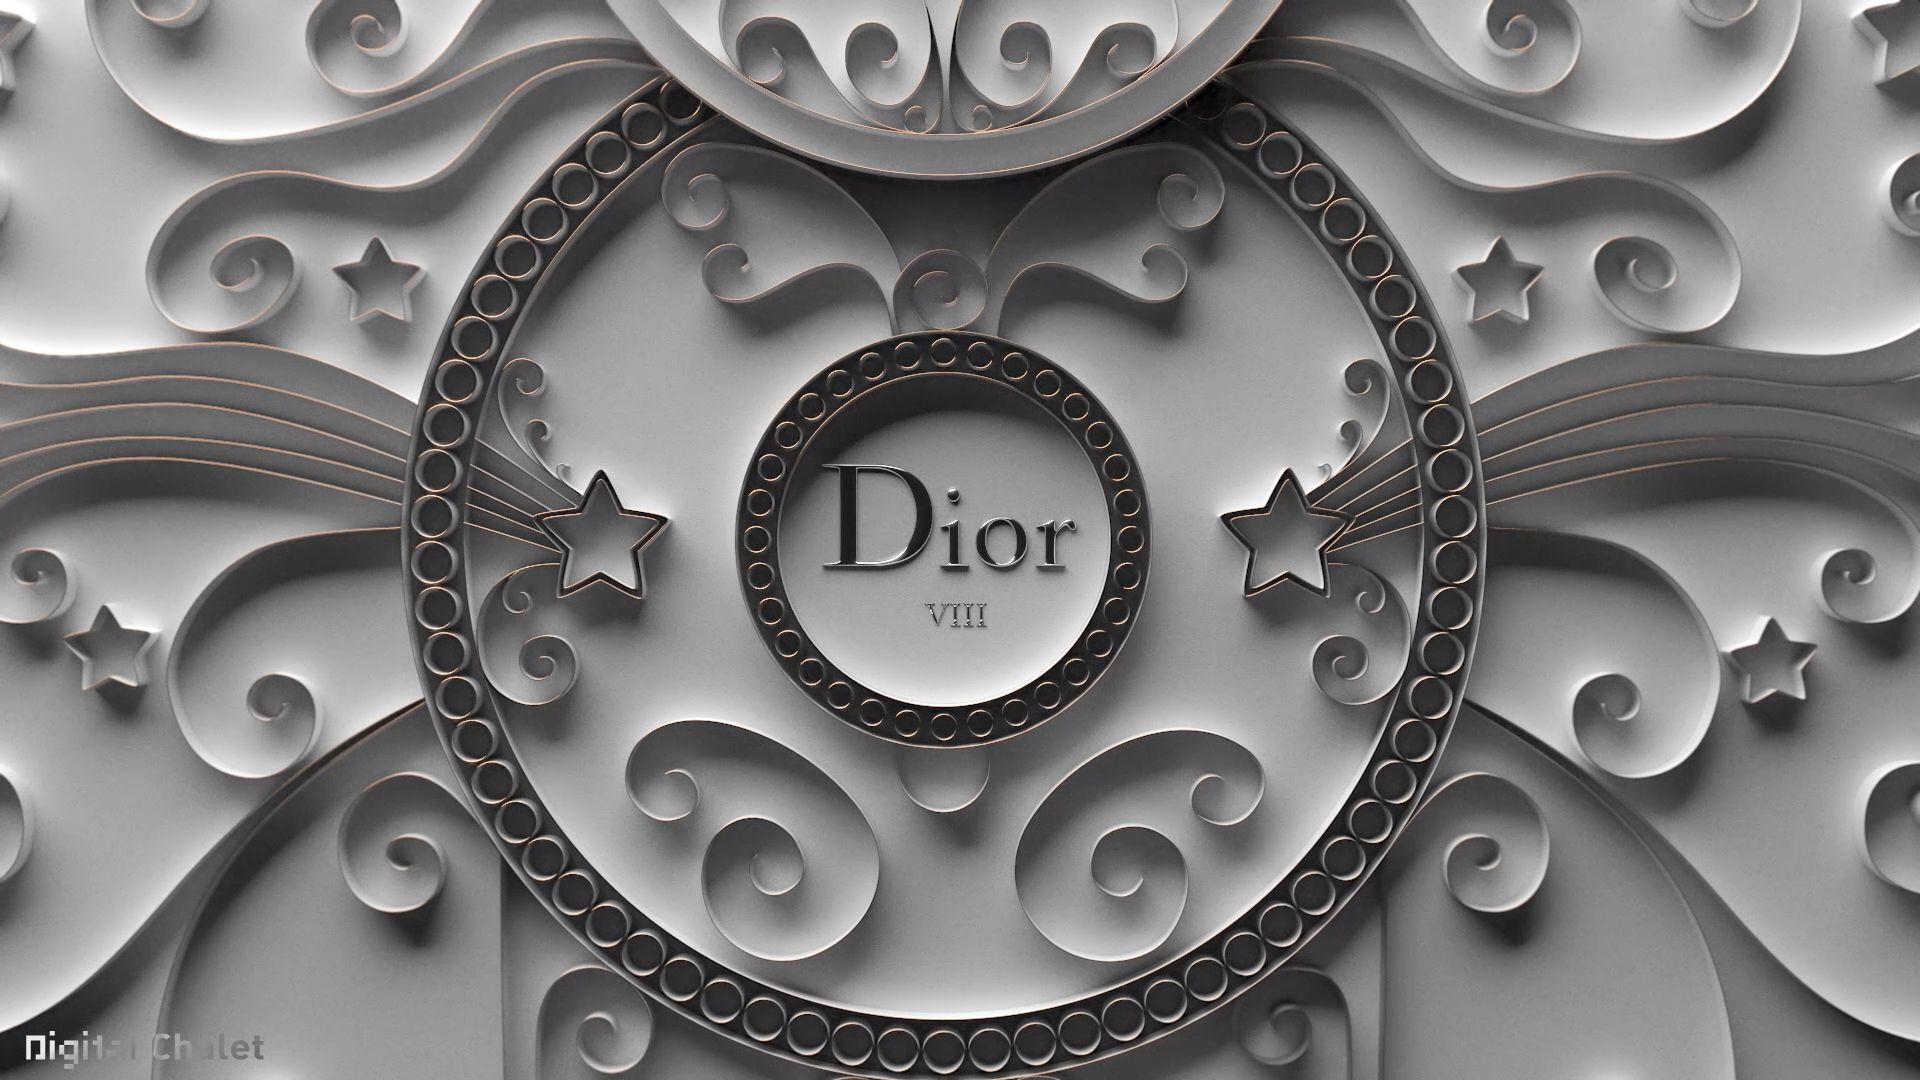 Dior wallpaper photo hd